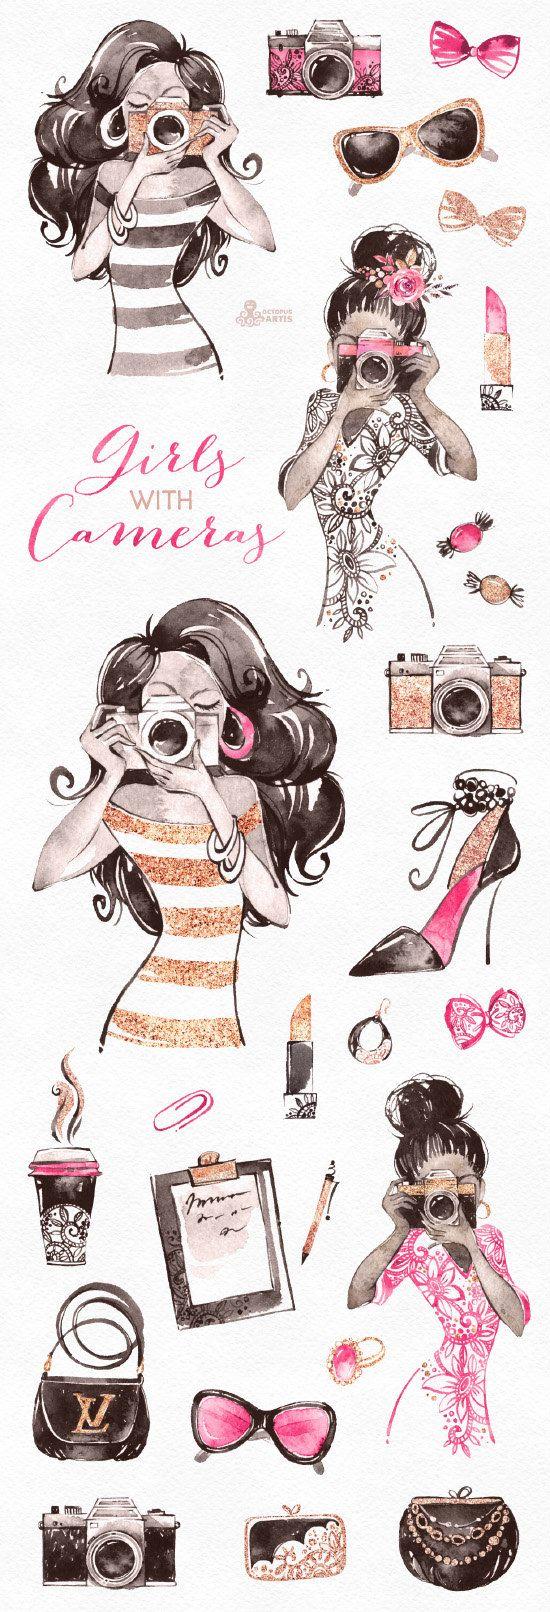 Chicas con cámaras. Acuarela gráfico fotógrafo por OctopusArtis